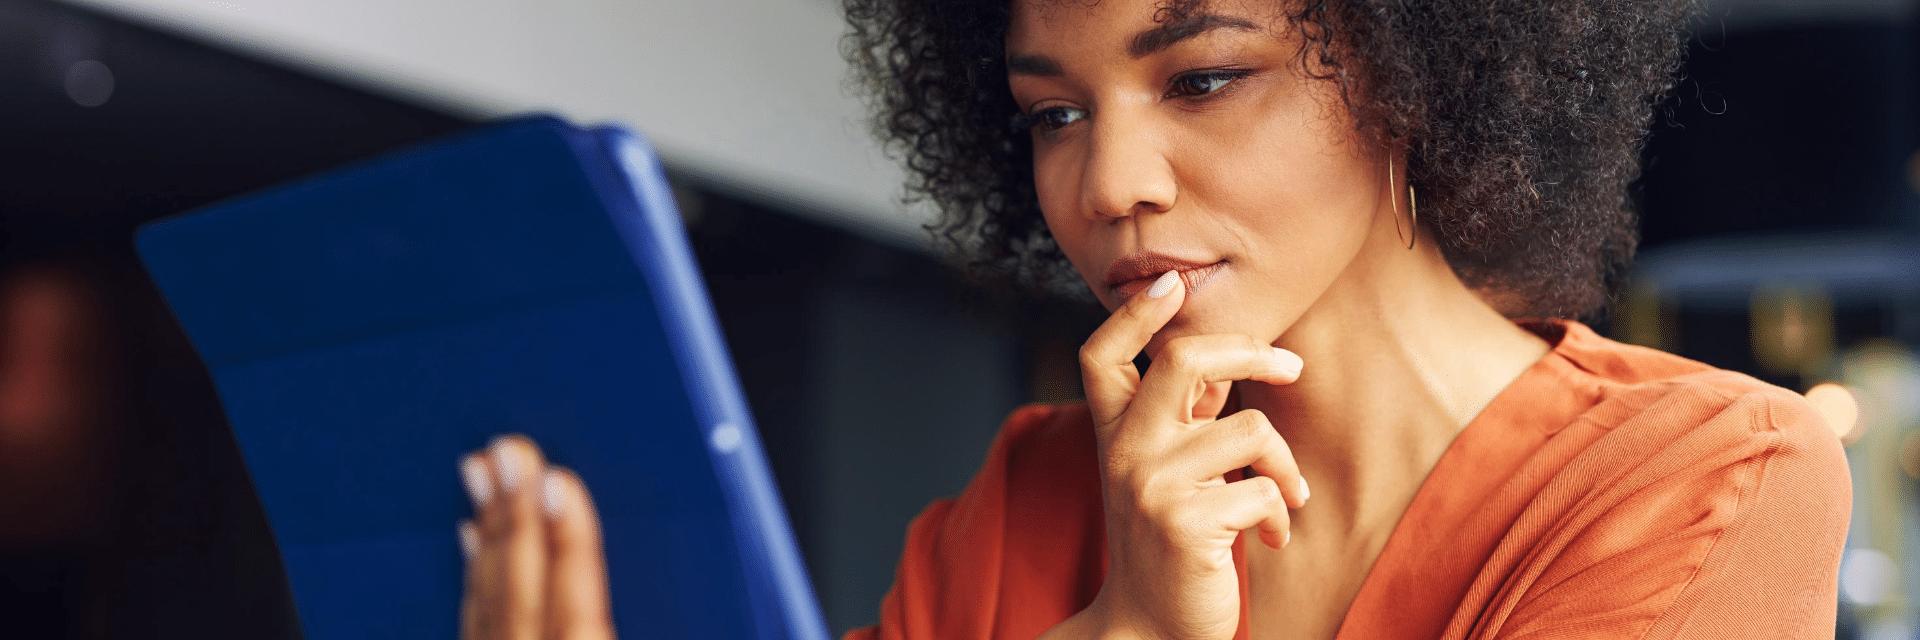 woman in an orange top looking at screen